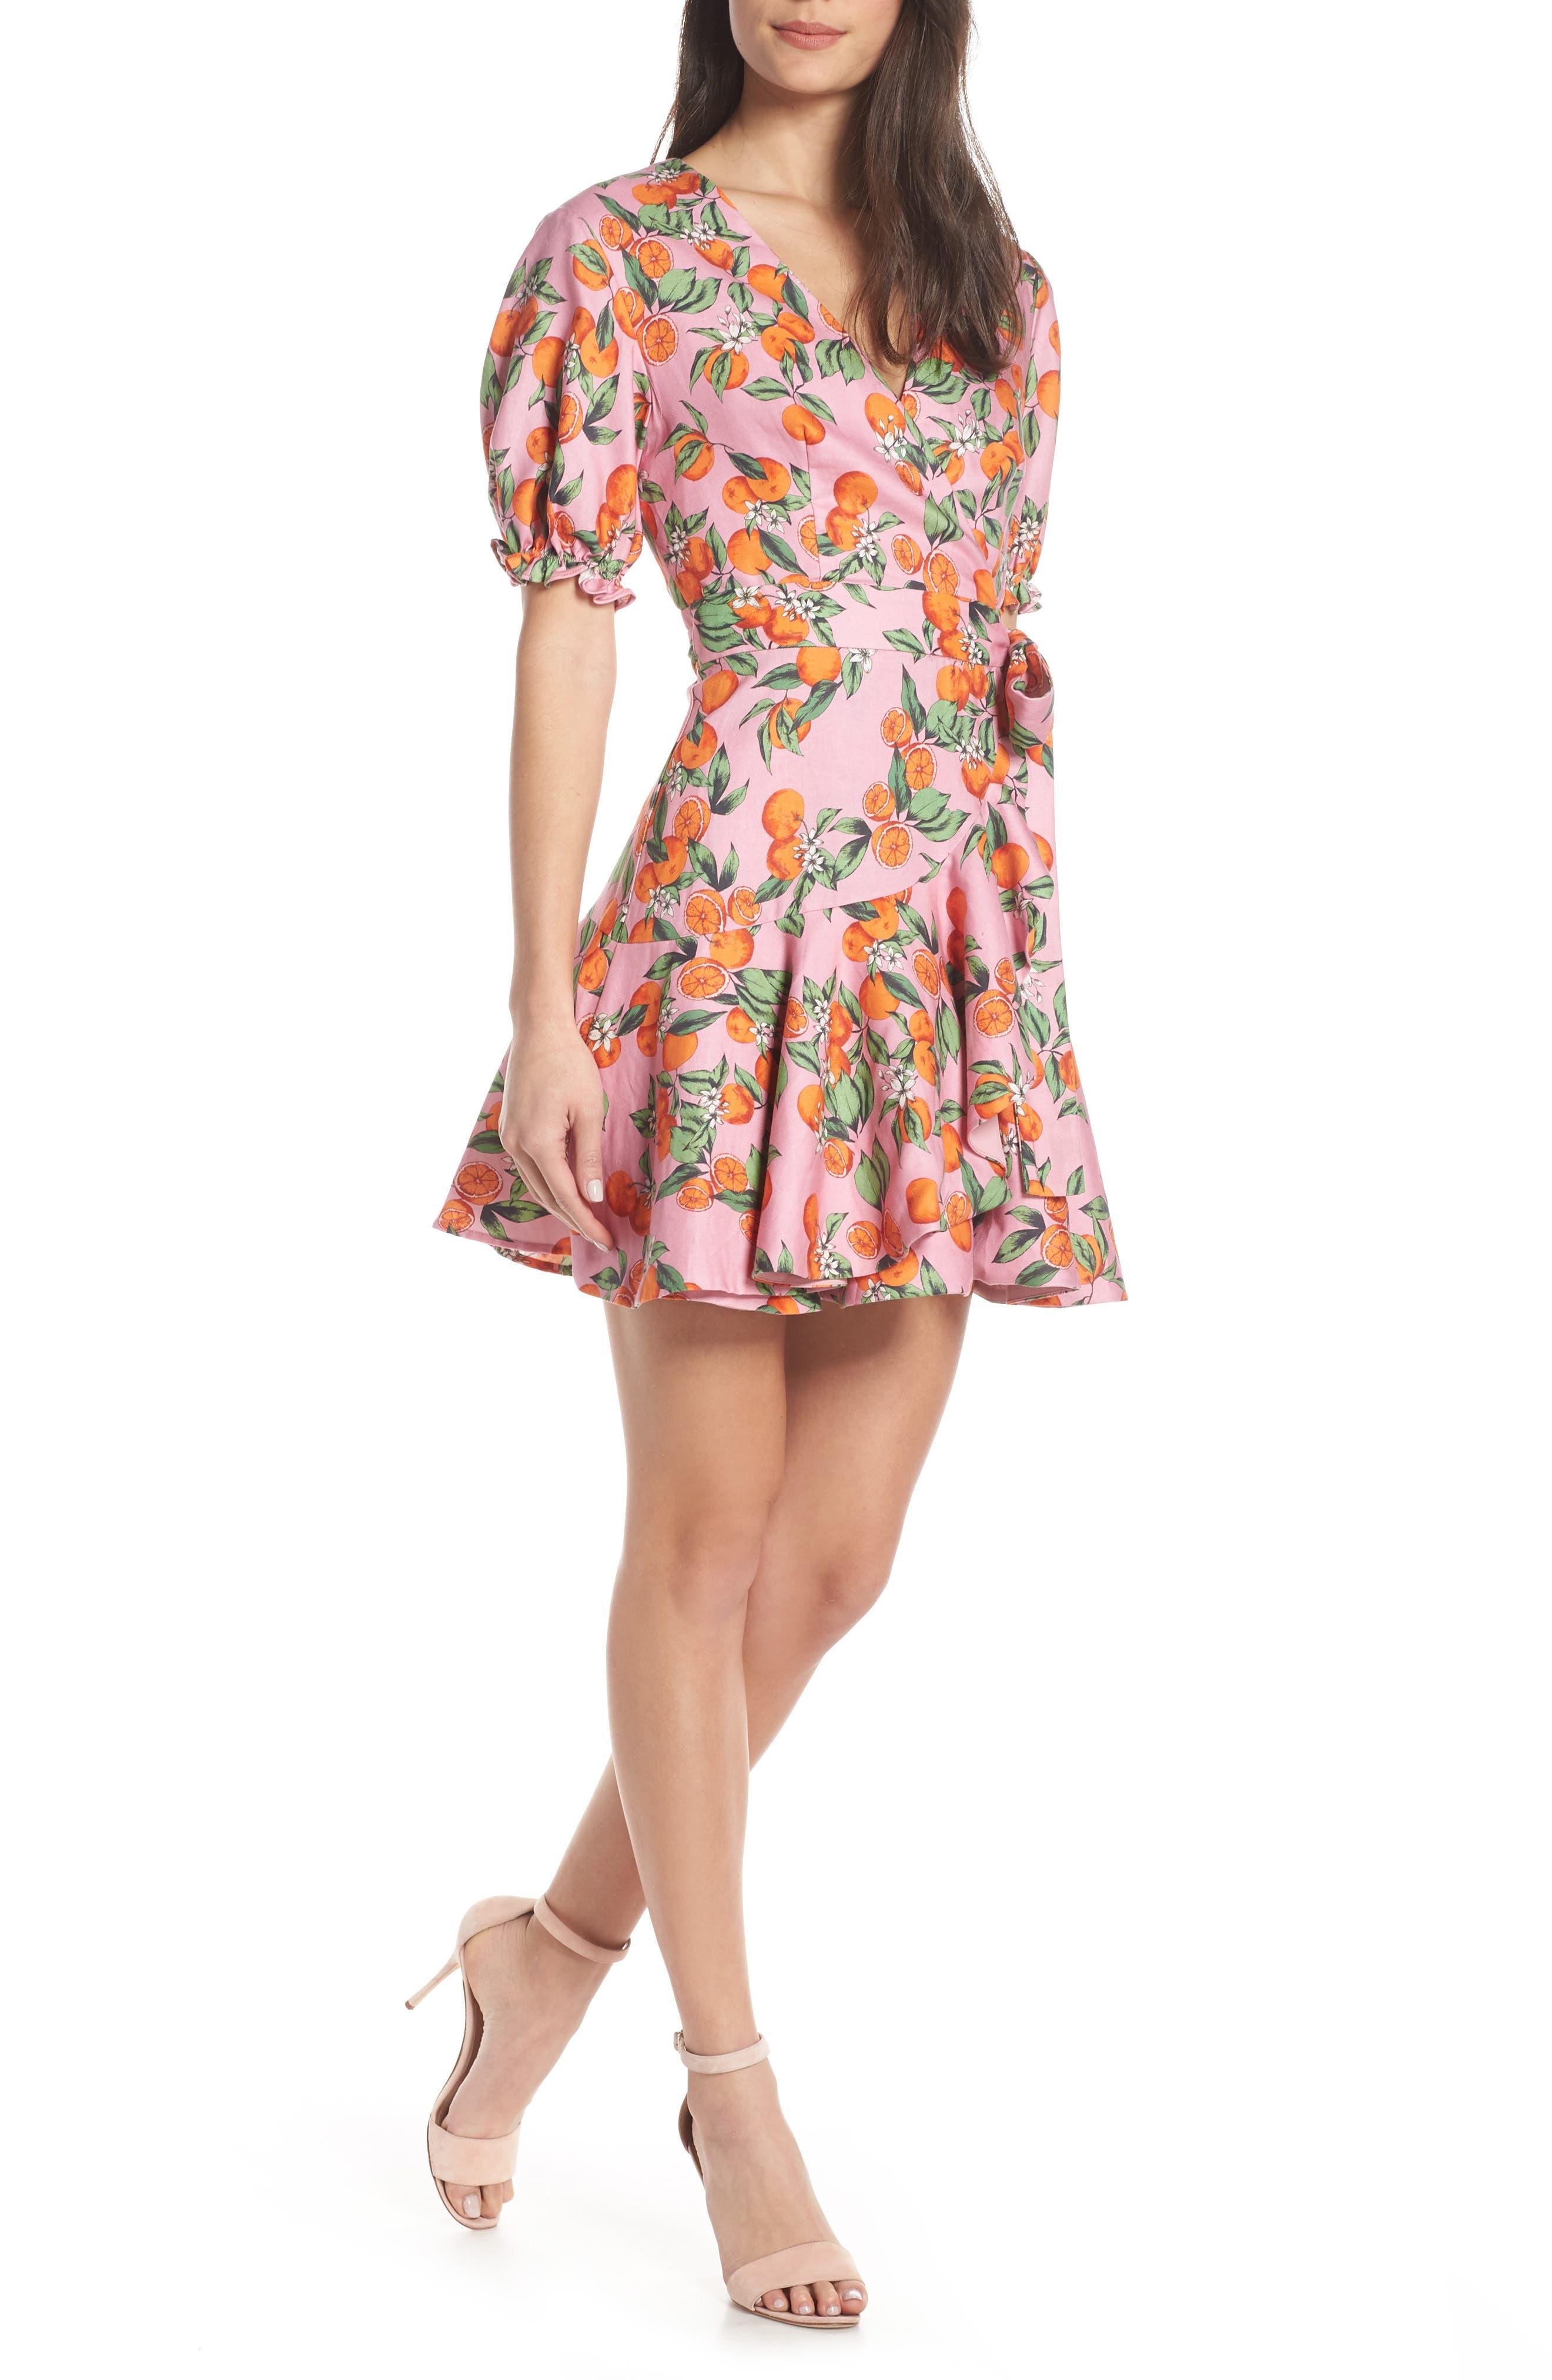 Finders Keepers Aranciata Print Wrap Dress, Pink